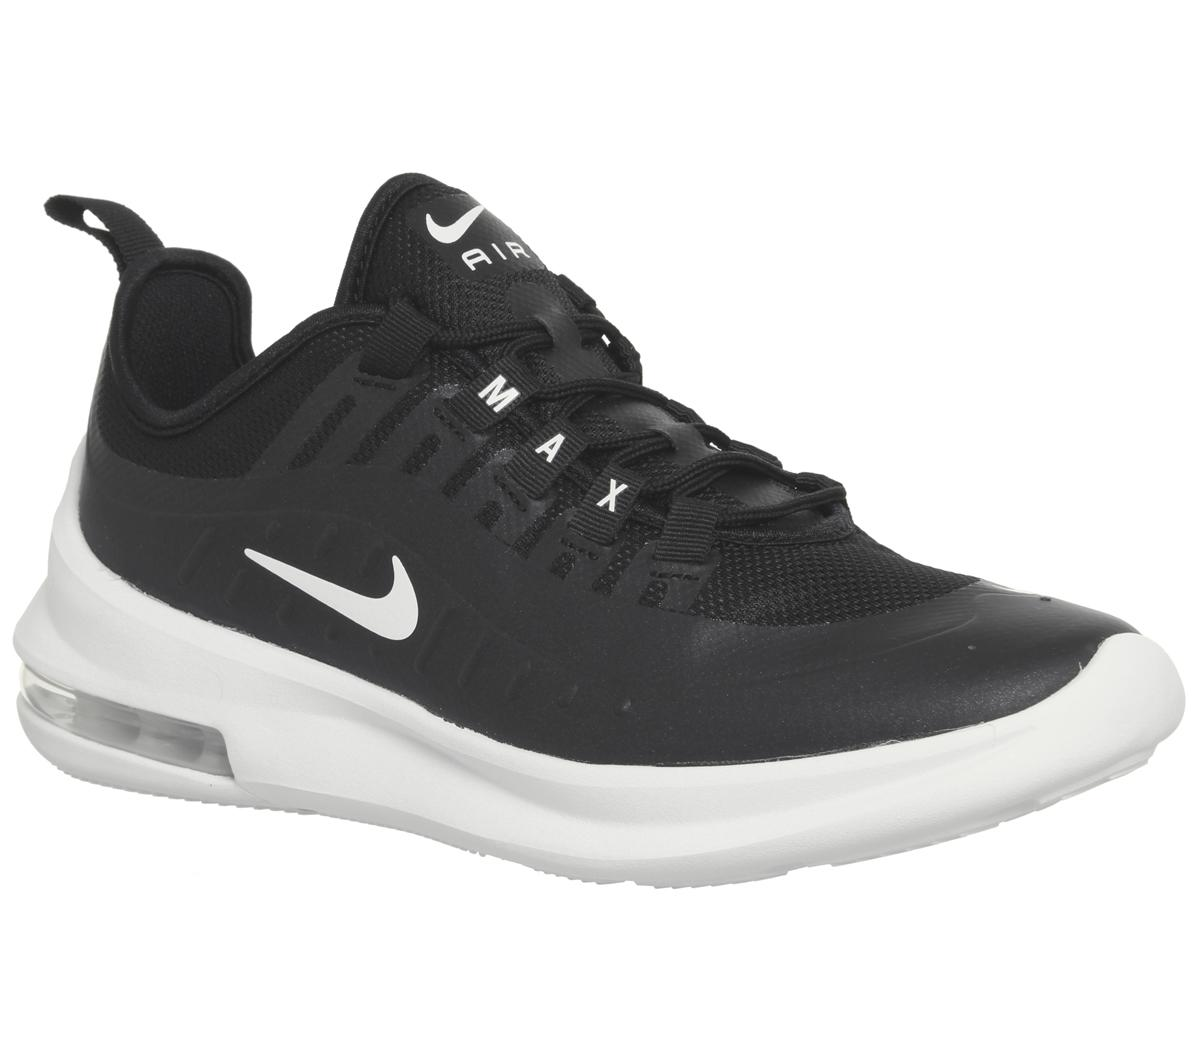 Nike Air Max Axis Trainers Black White